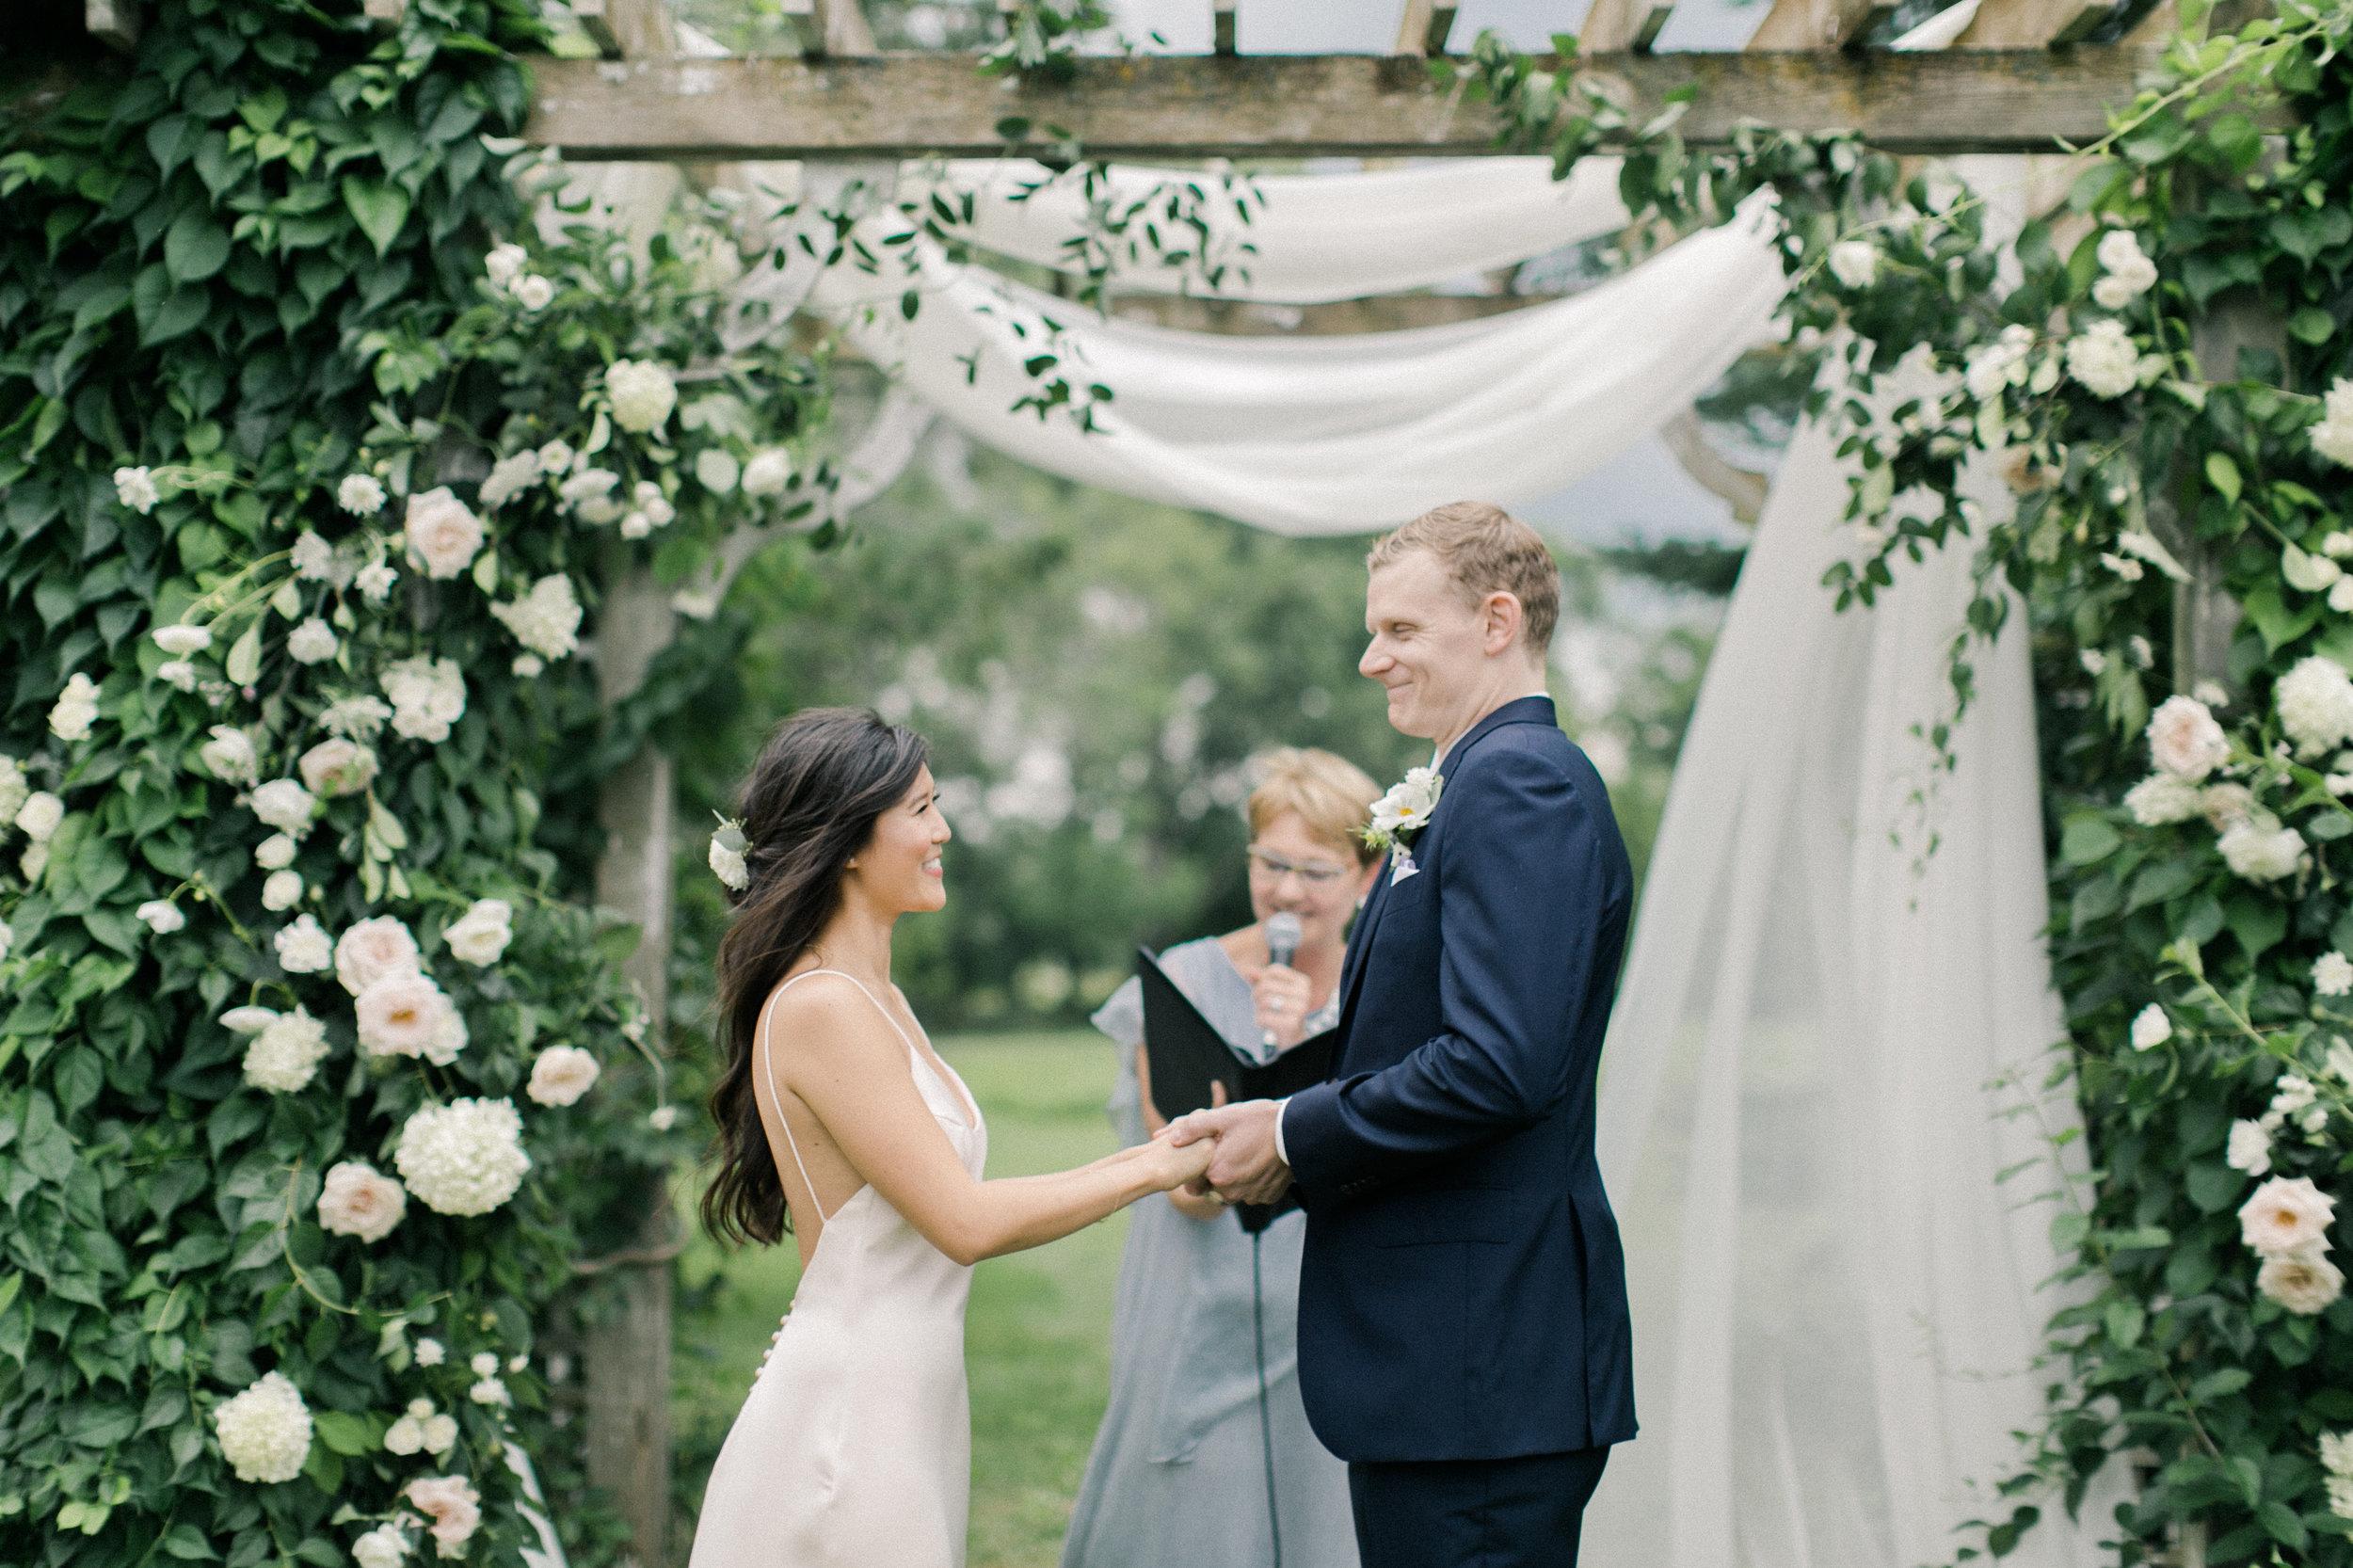 toronto-wedding-photographer-soft-bright-pretty-pastel-richelle-hunter-nicola-prentis-30.jpg